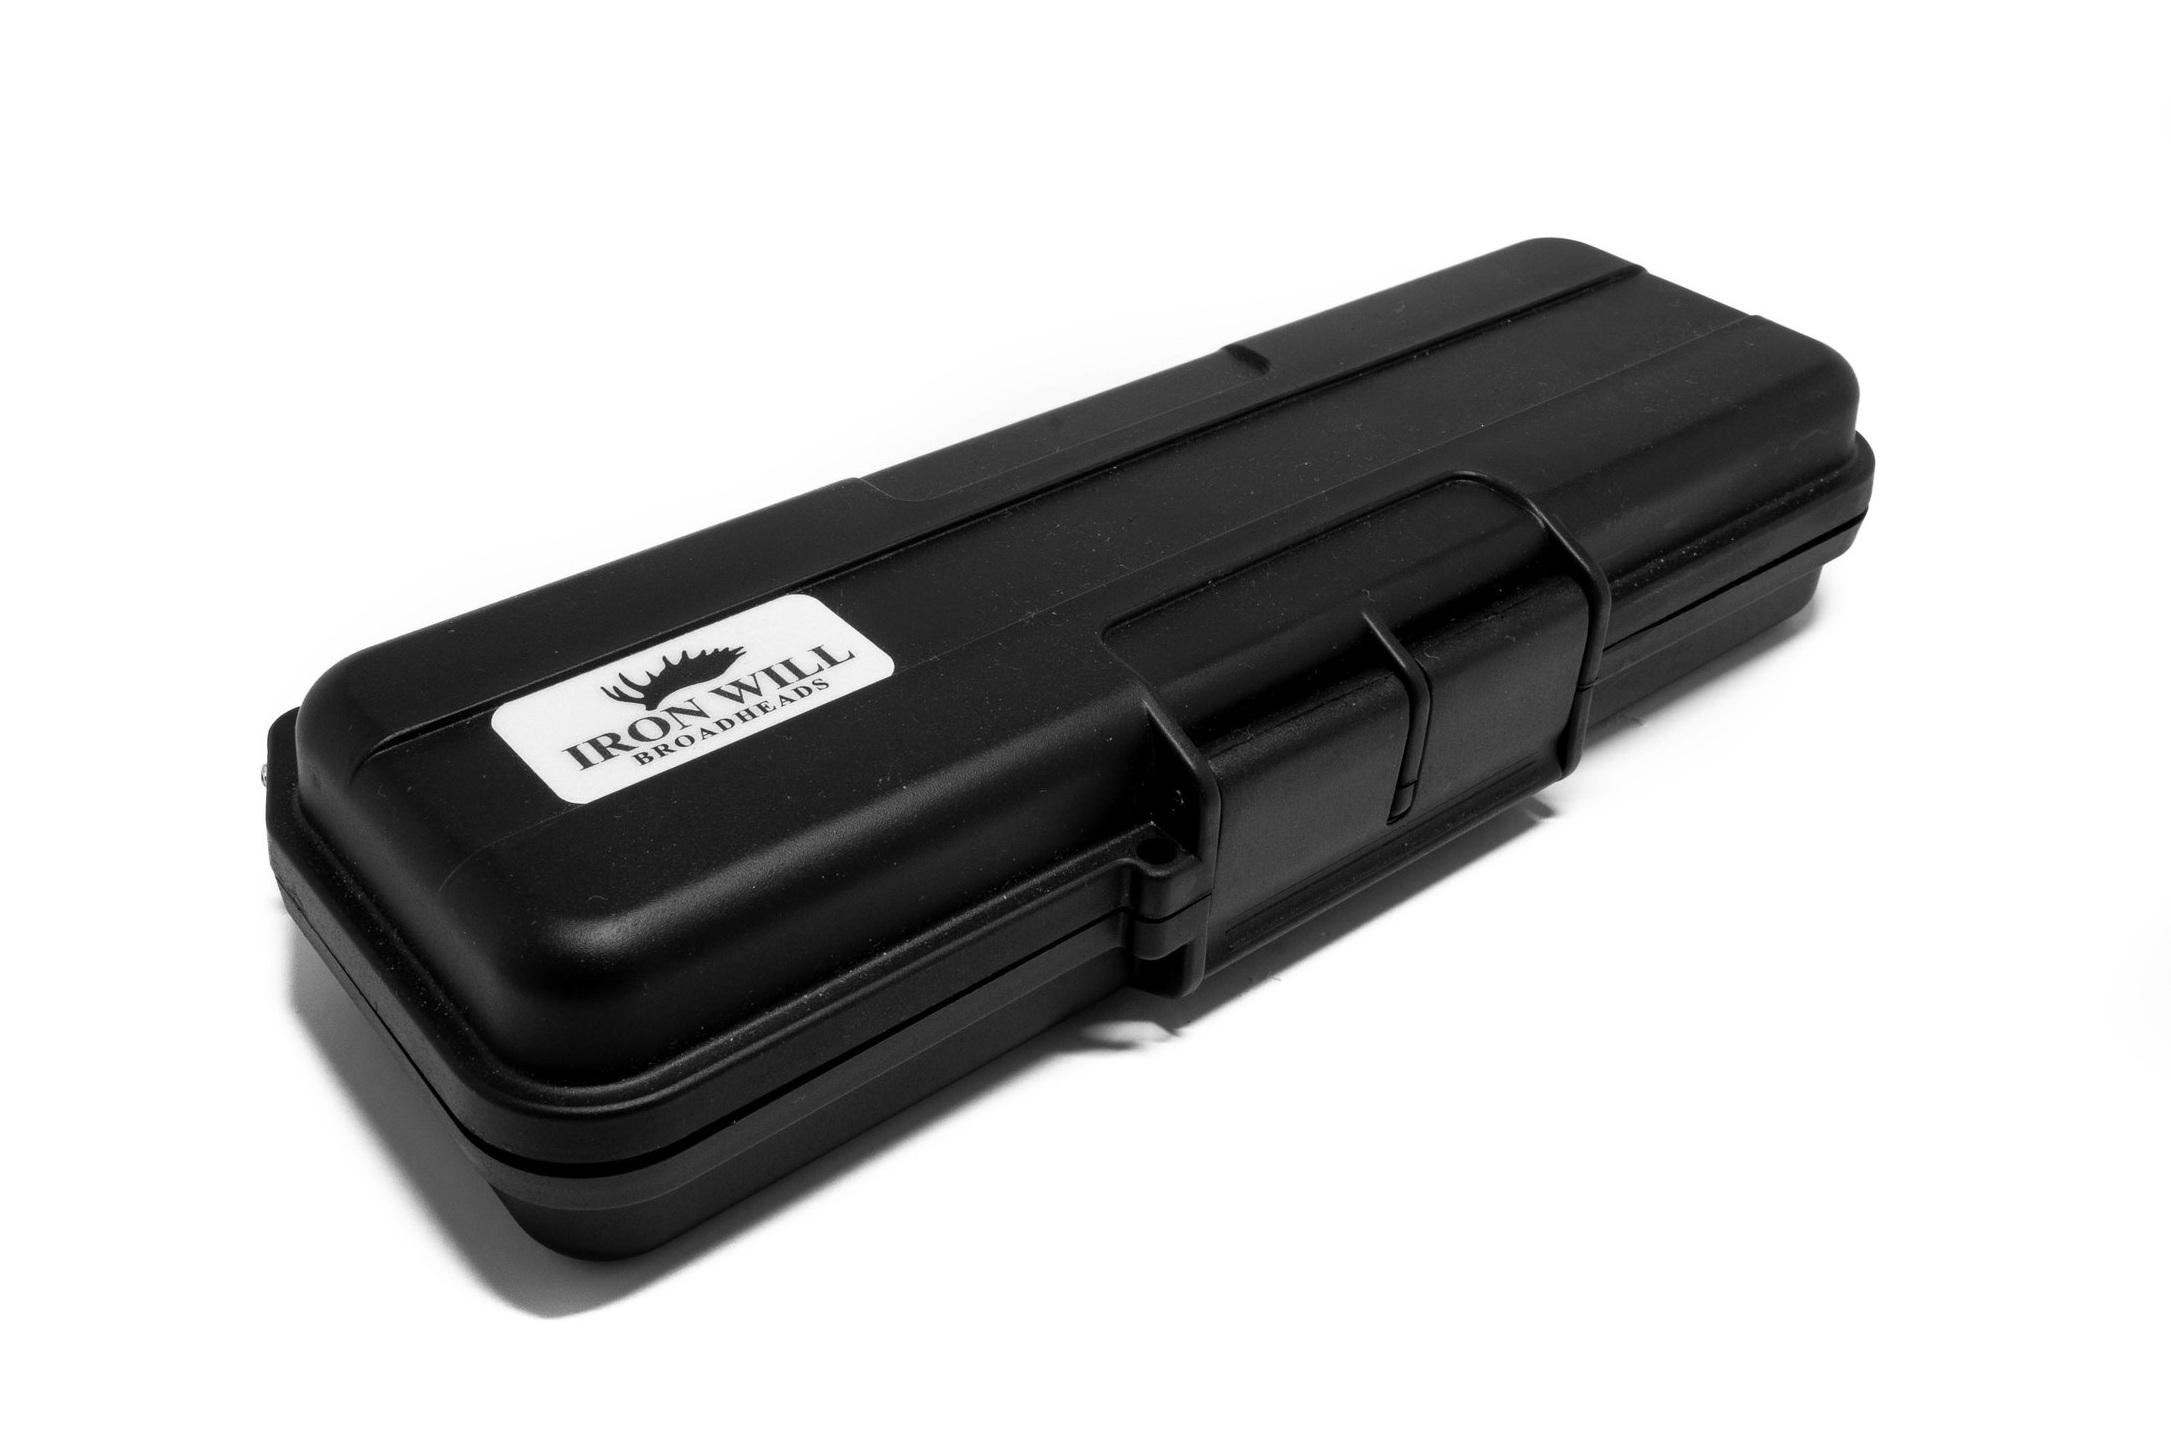 Broadhead Travel Case - $29.95